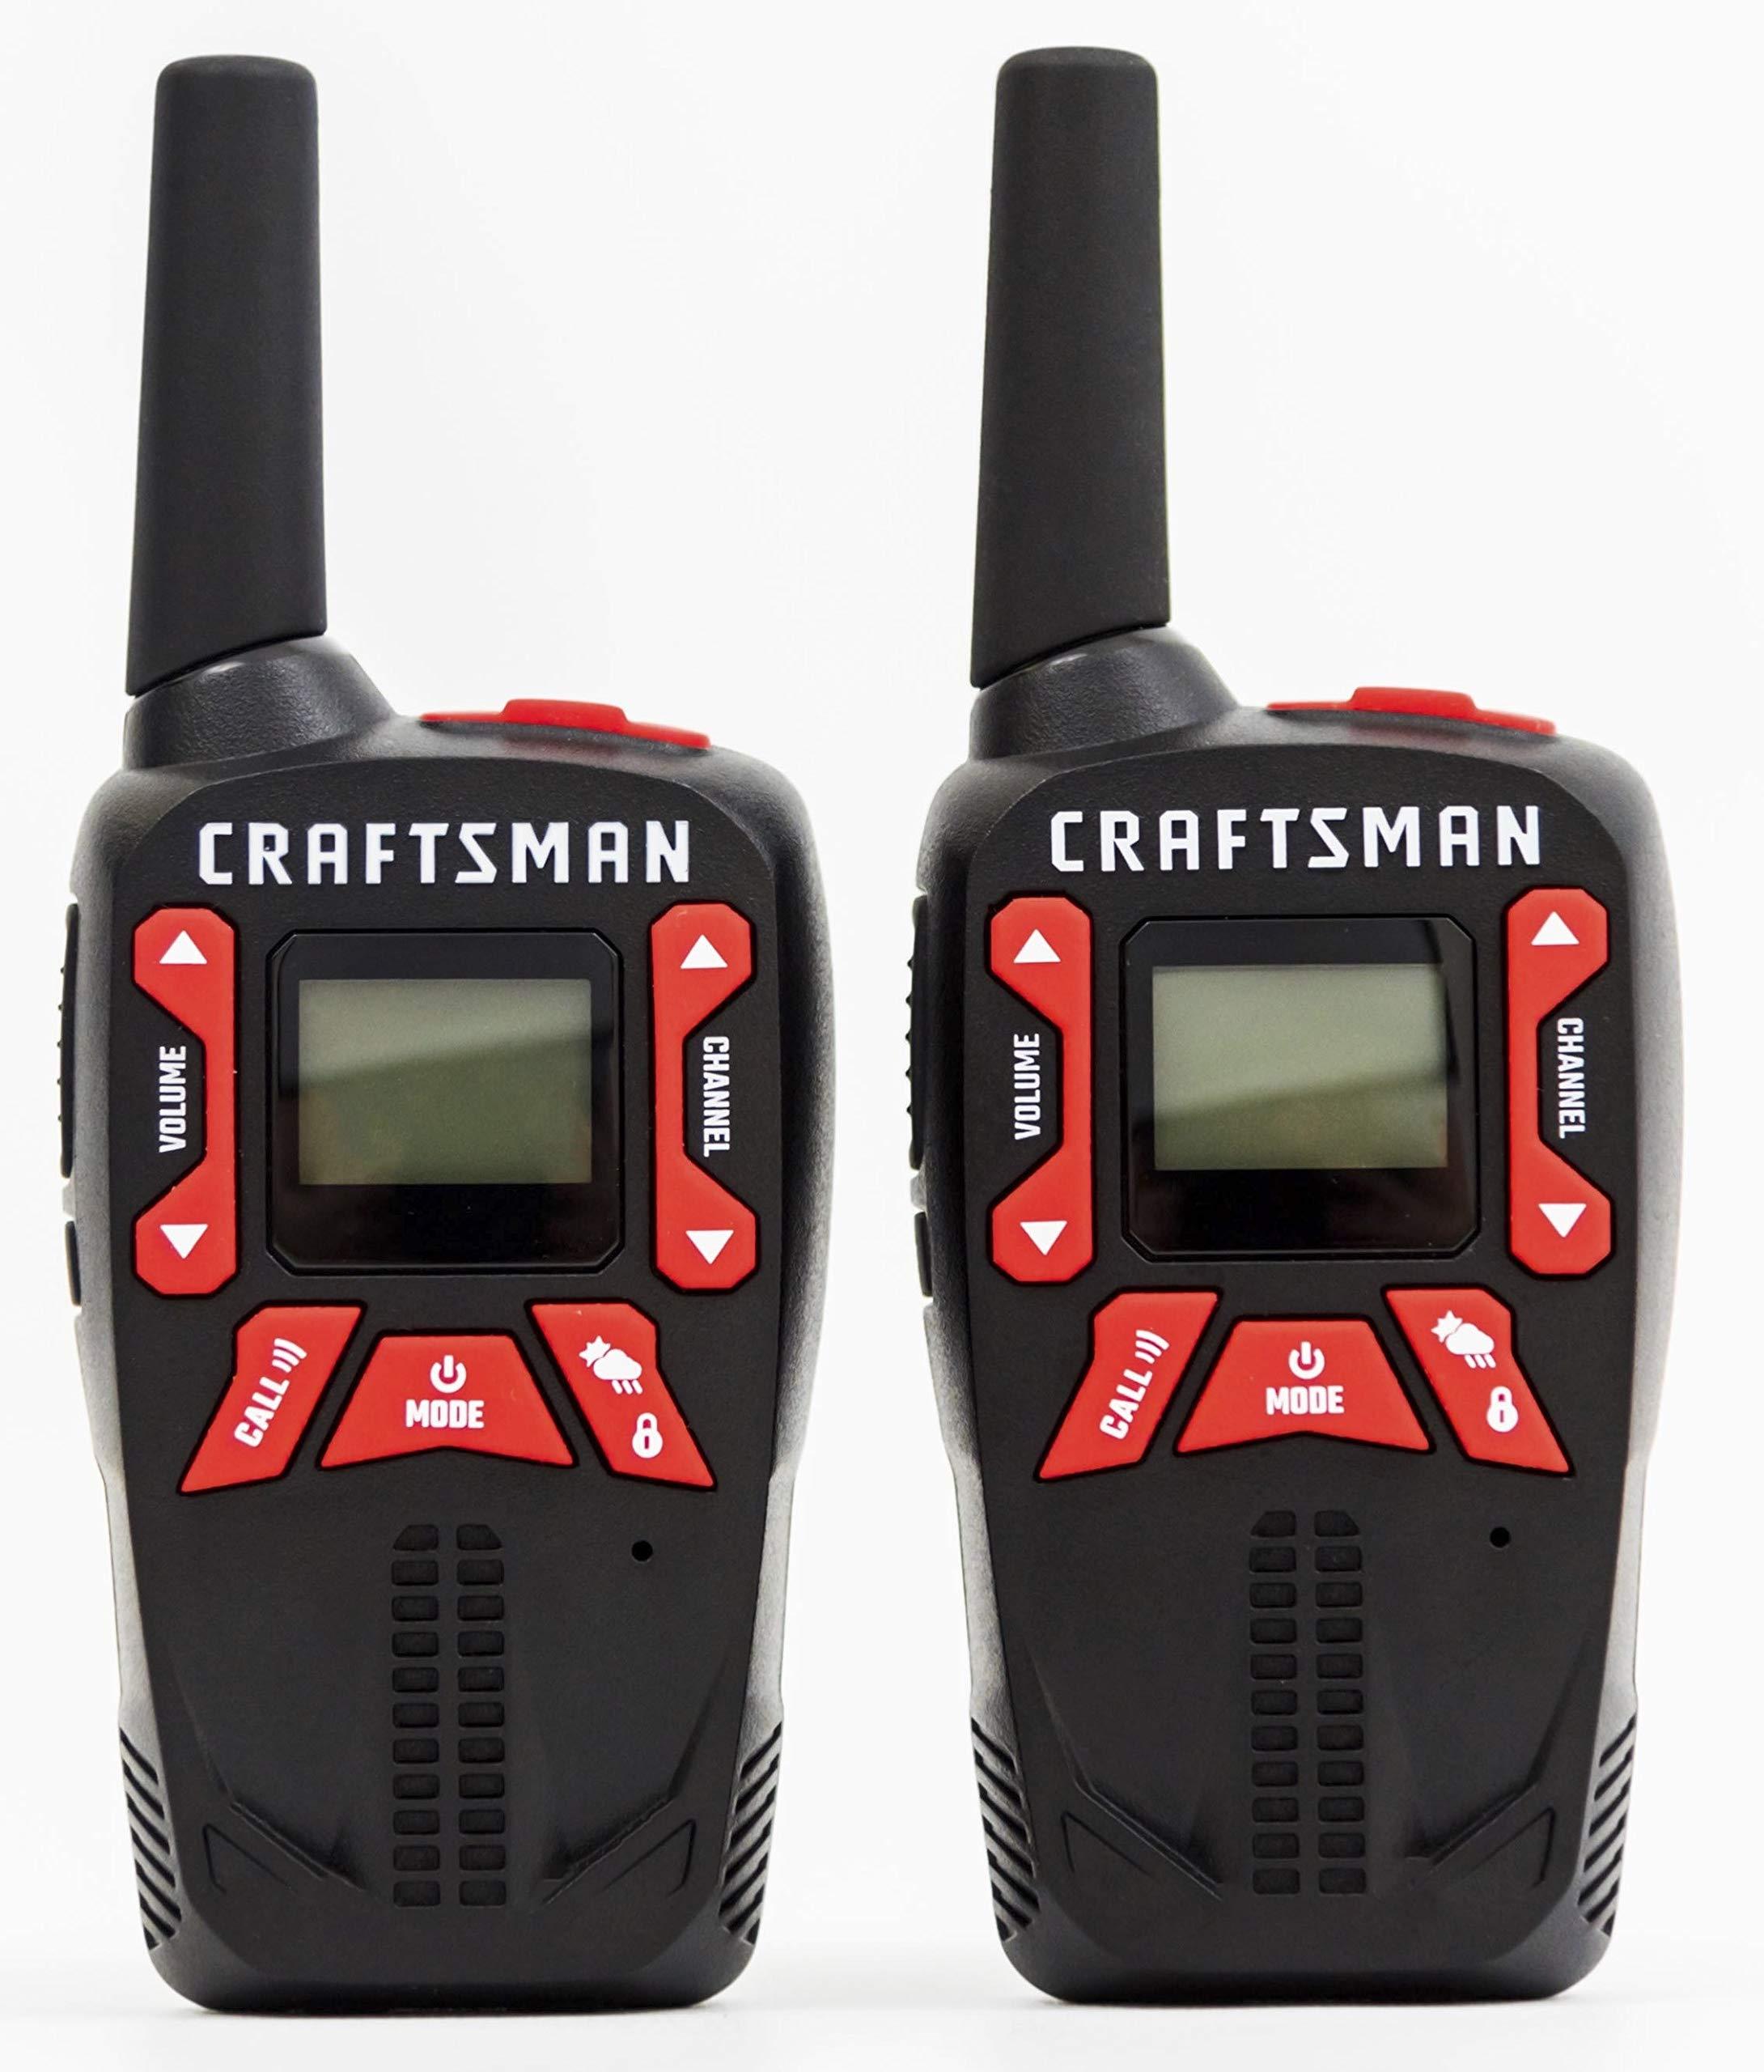 Craftsman CMXZRAZF333 Walkie Talkies Two-Way Business Radios (Pair) by Craftsman (Image #1)